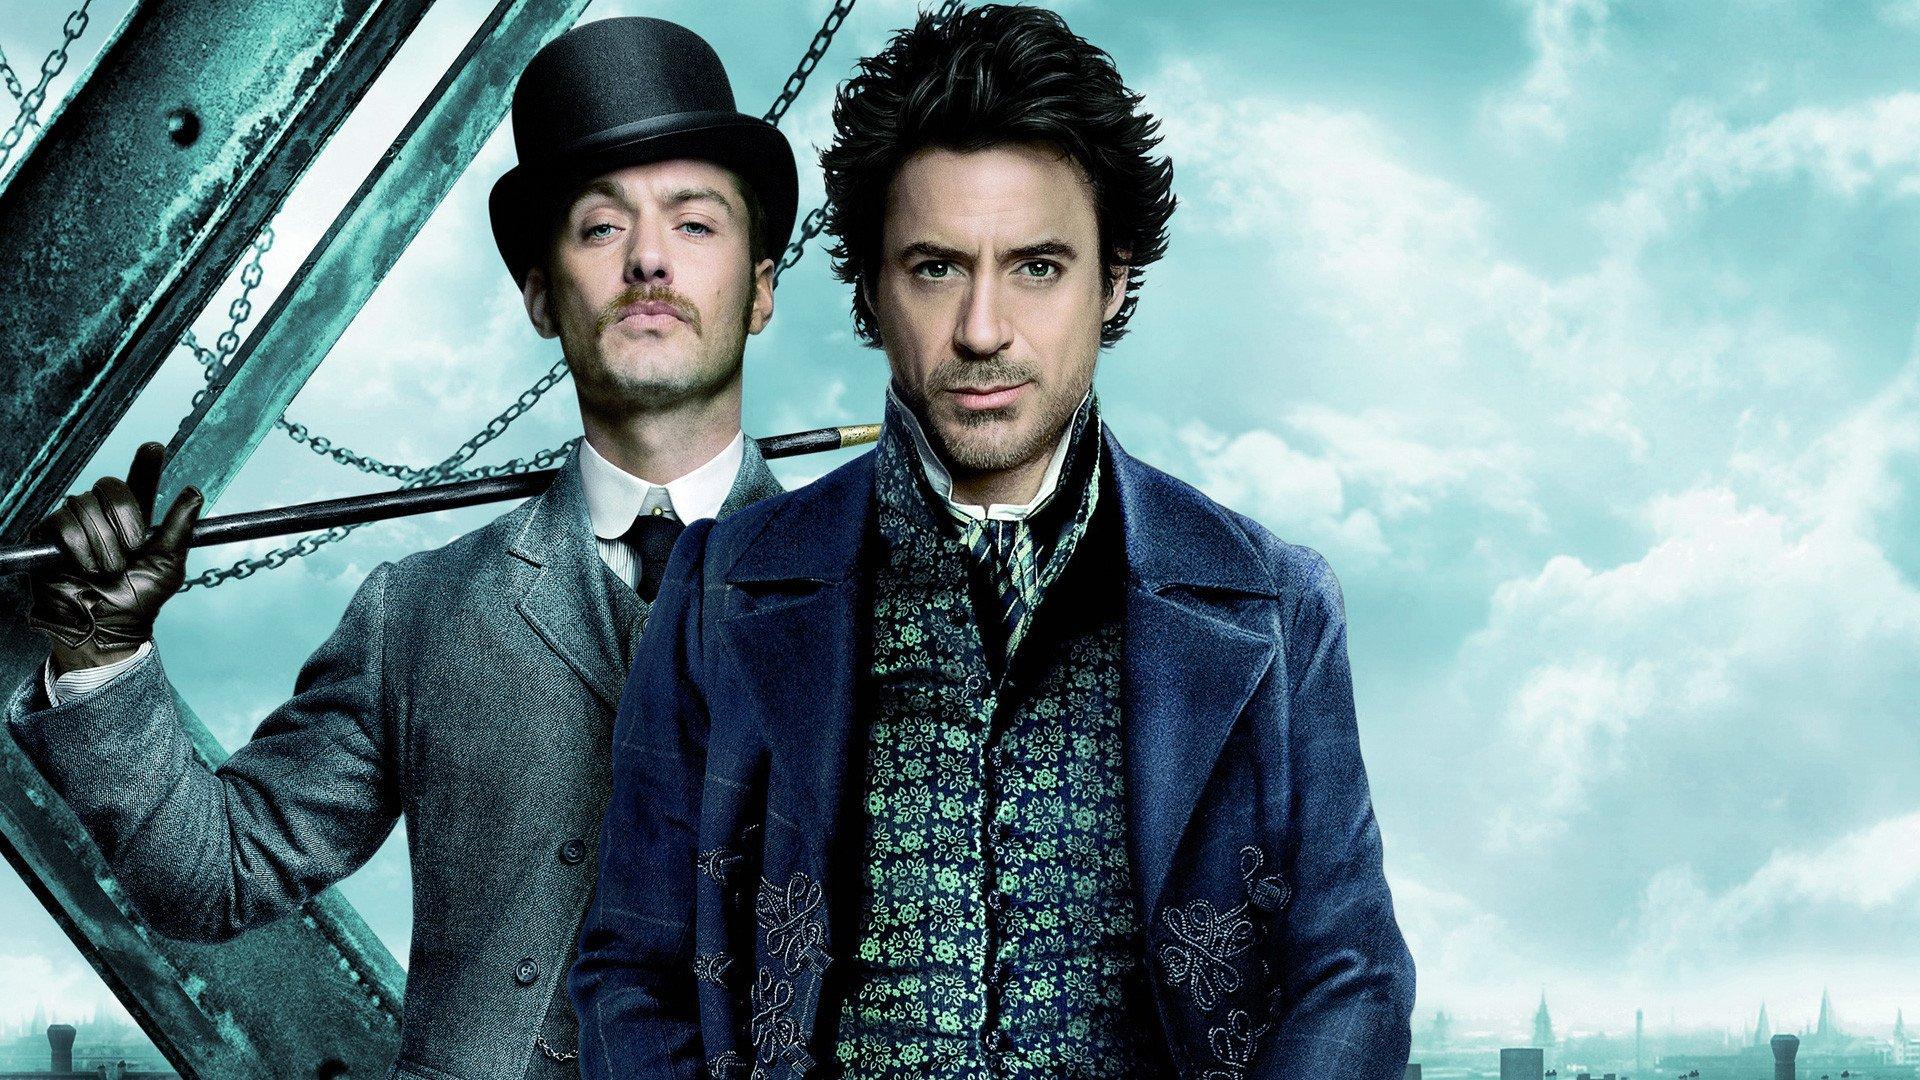 Sherlock Holmes 3 May Start Filming This Fall 1